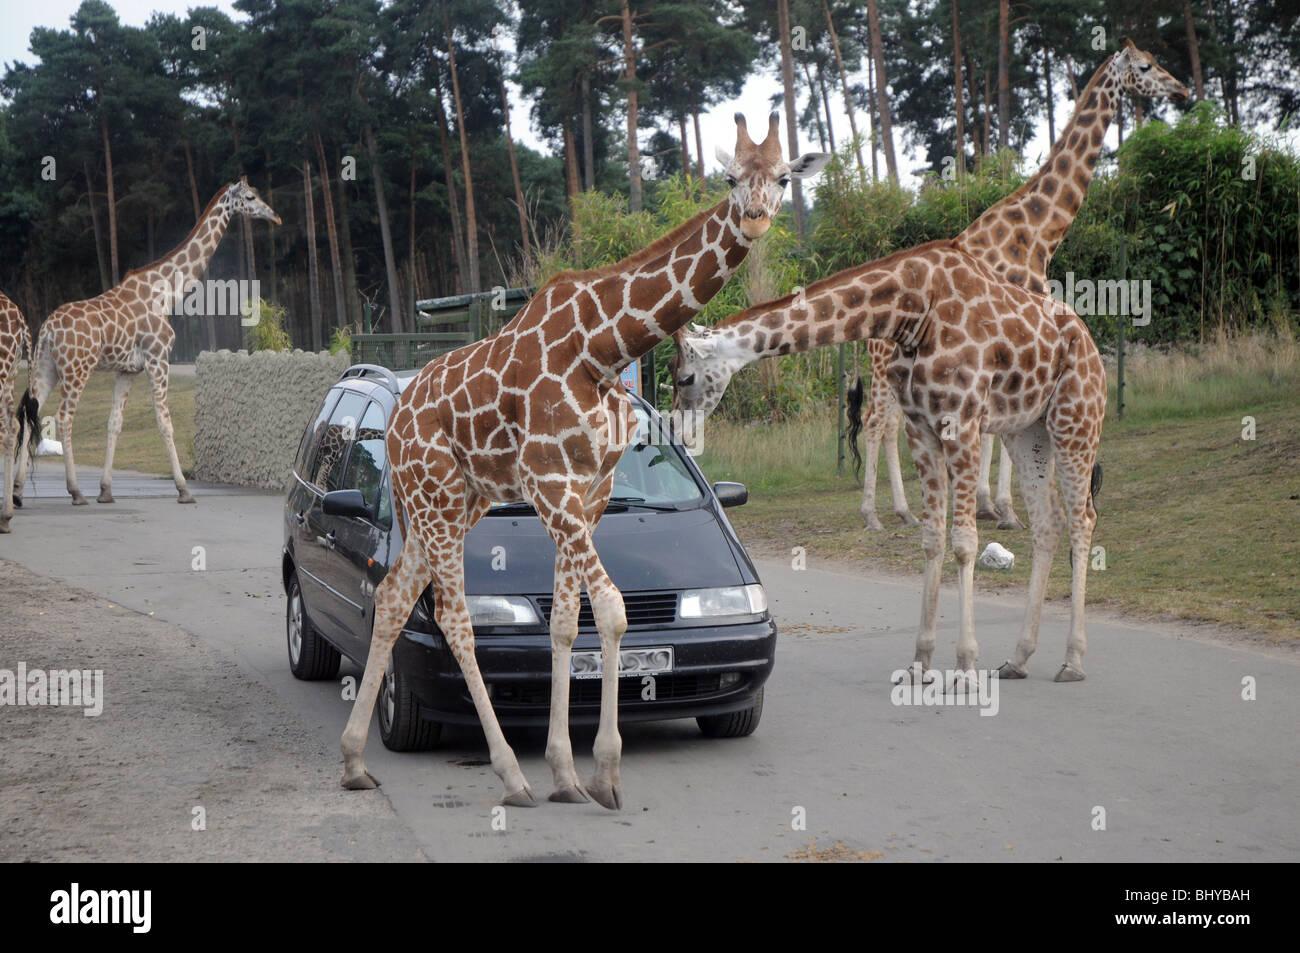 Giraffes In Serengeti Park In Hodenhagen Germany